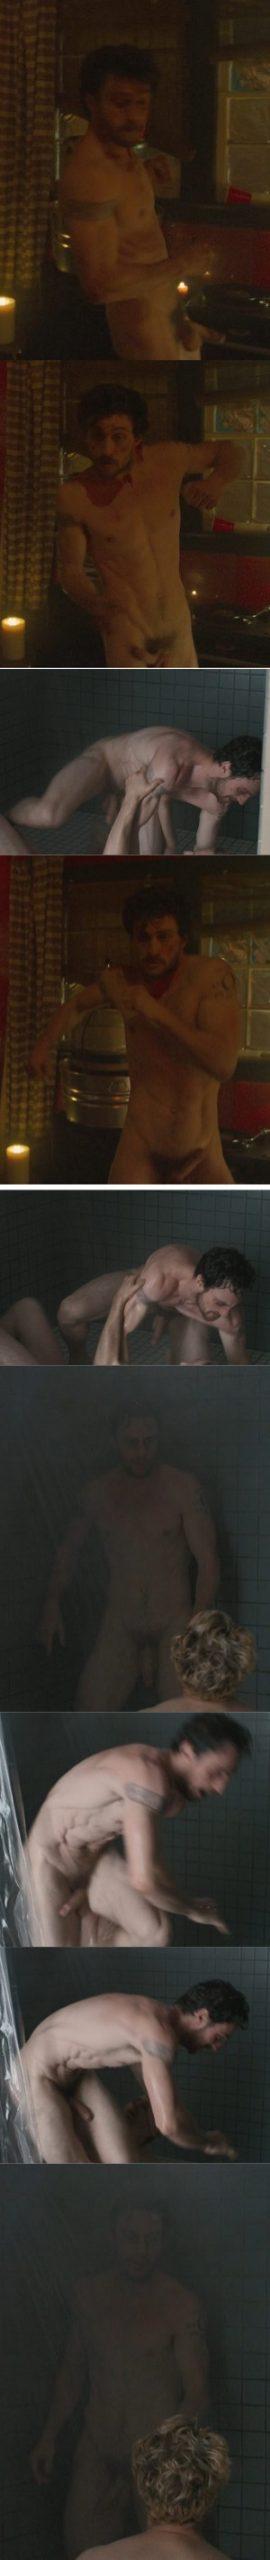 Aaron Taylor Johnson full frontal naked